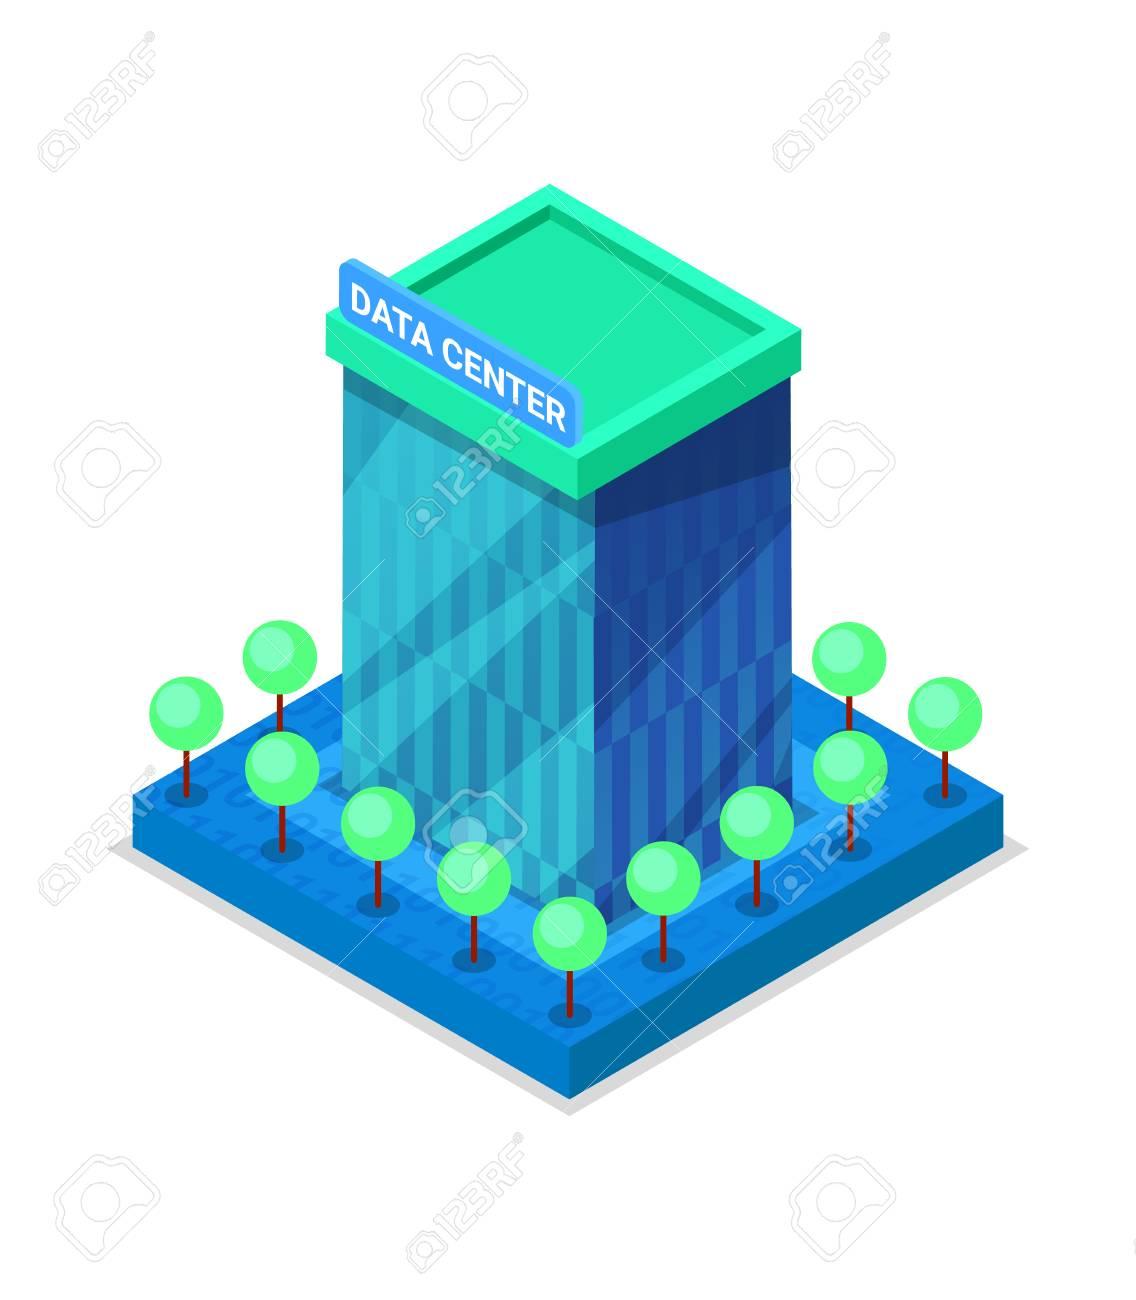 Modern data center building isometric 3D icon. - 91972971